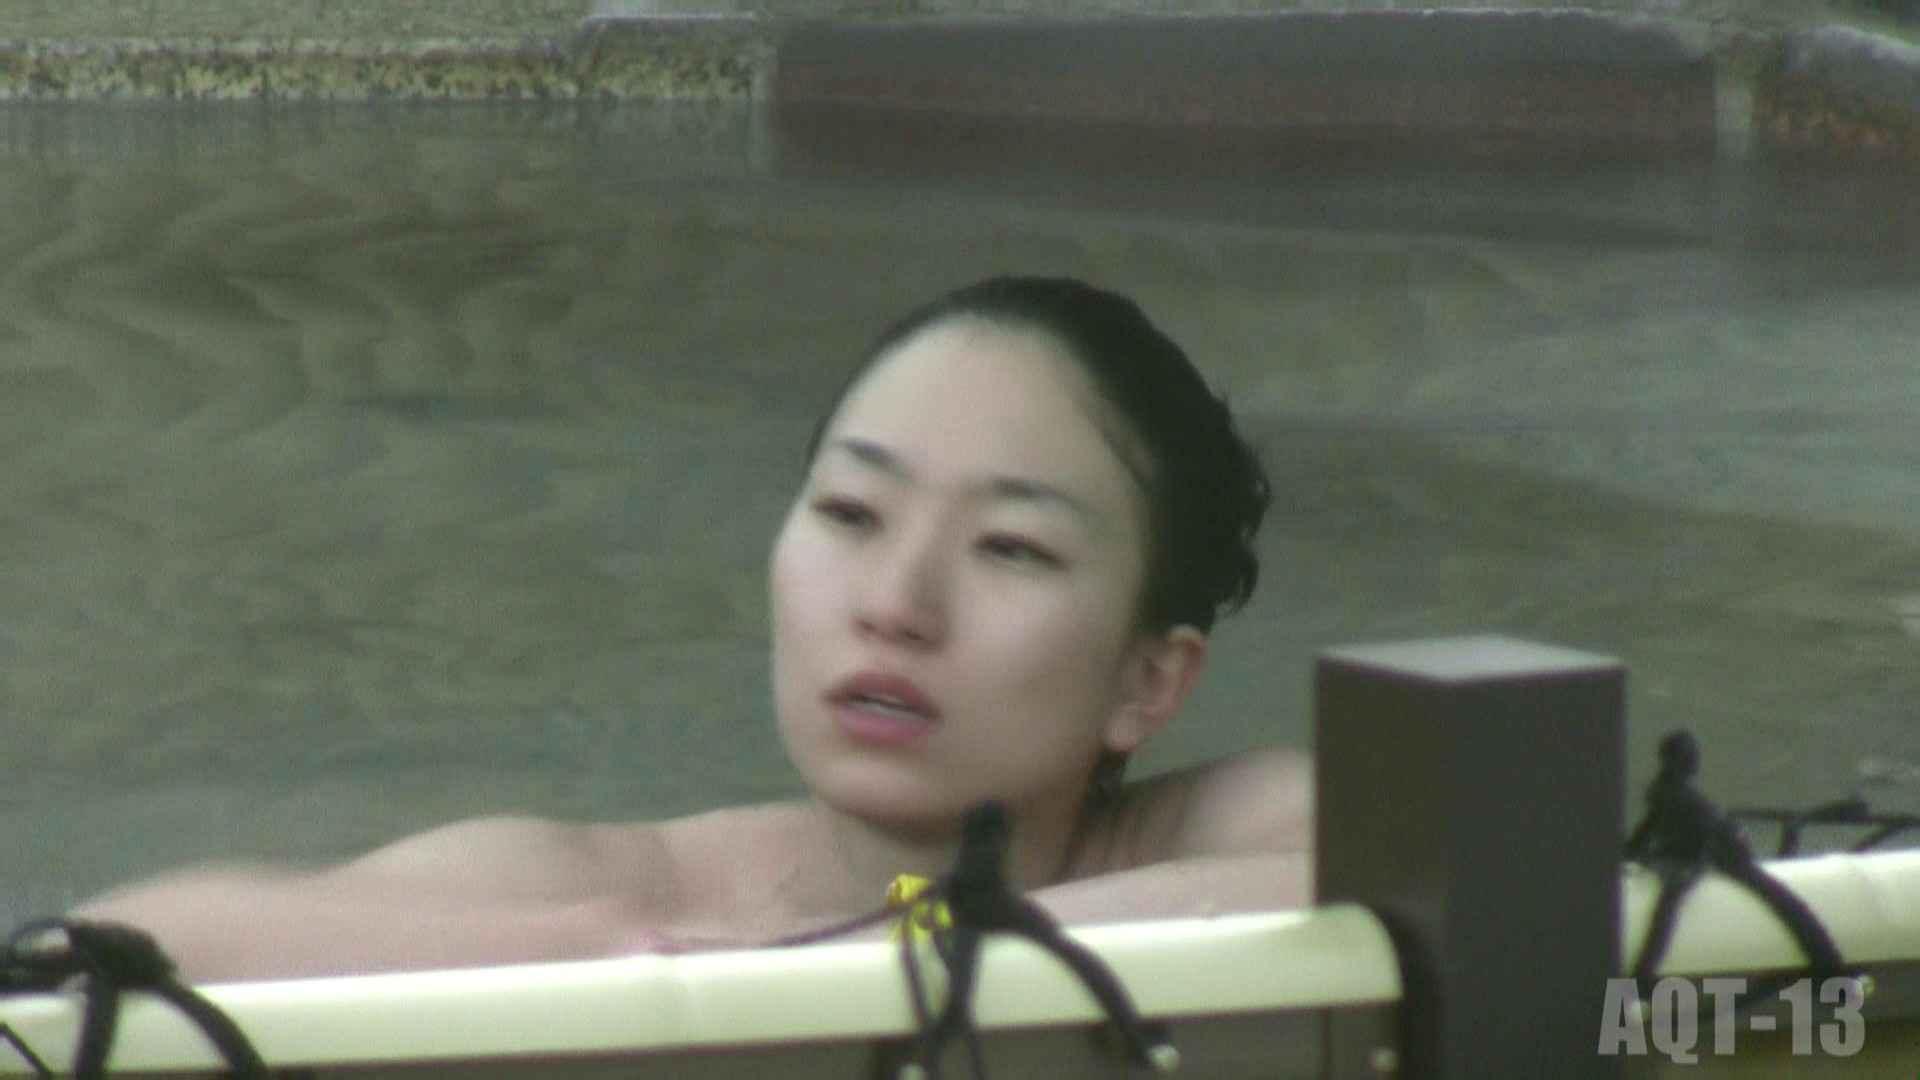 Aquaな露天風呂Vol.818 いやらしいOL おめこ無修正動画無料 72連発 23